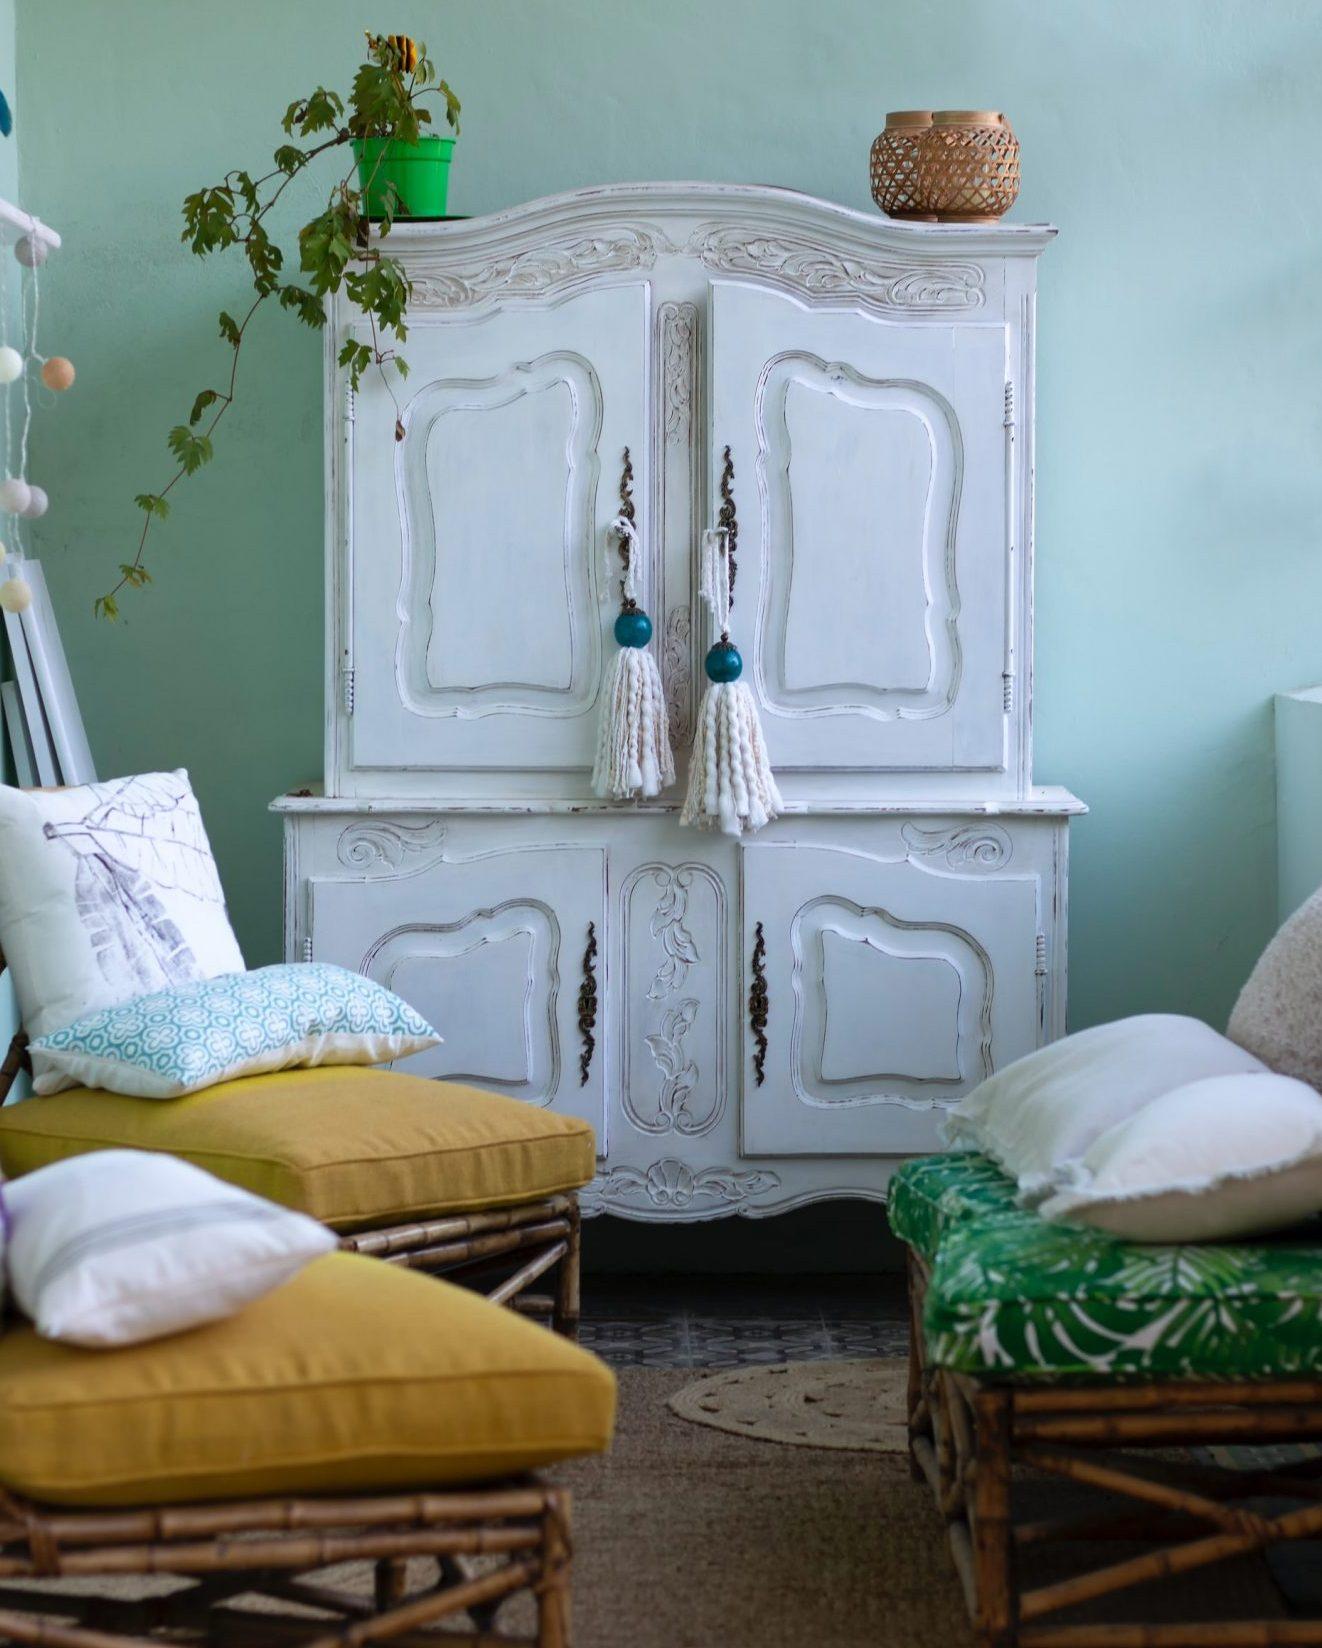 upcycling furniture meuble recyclés diy écologie tendance 2021